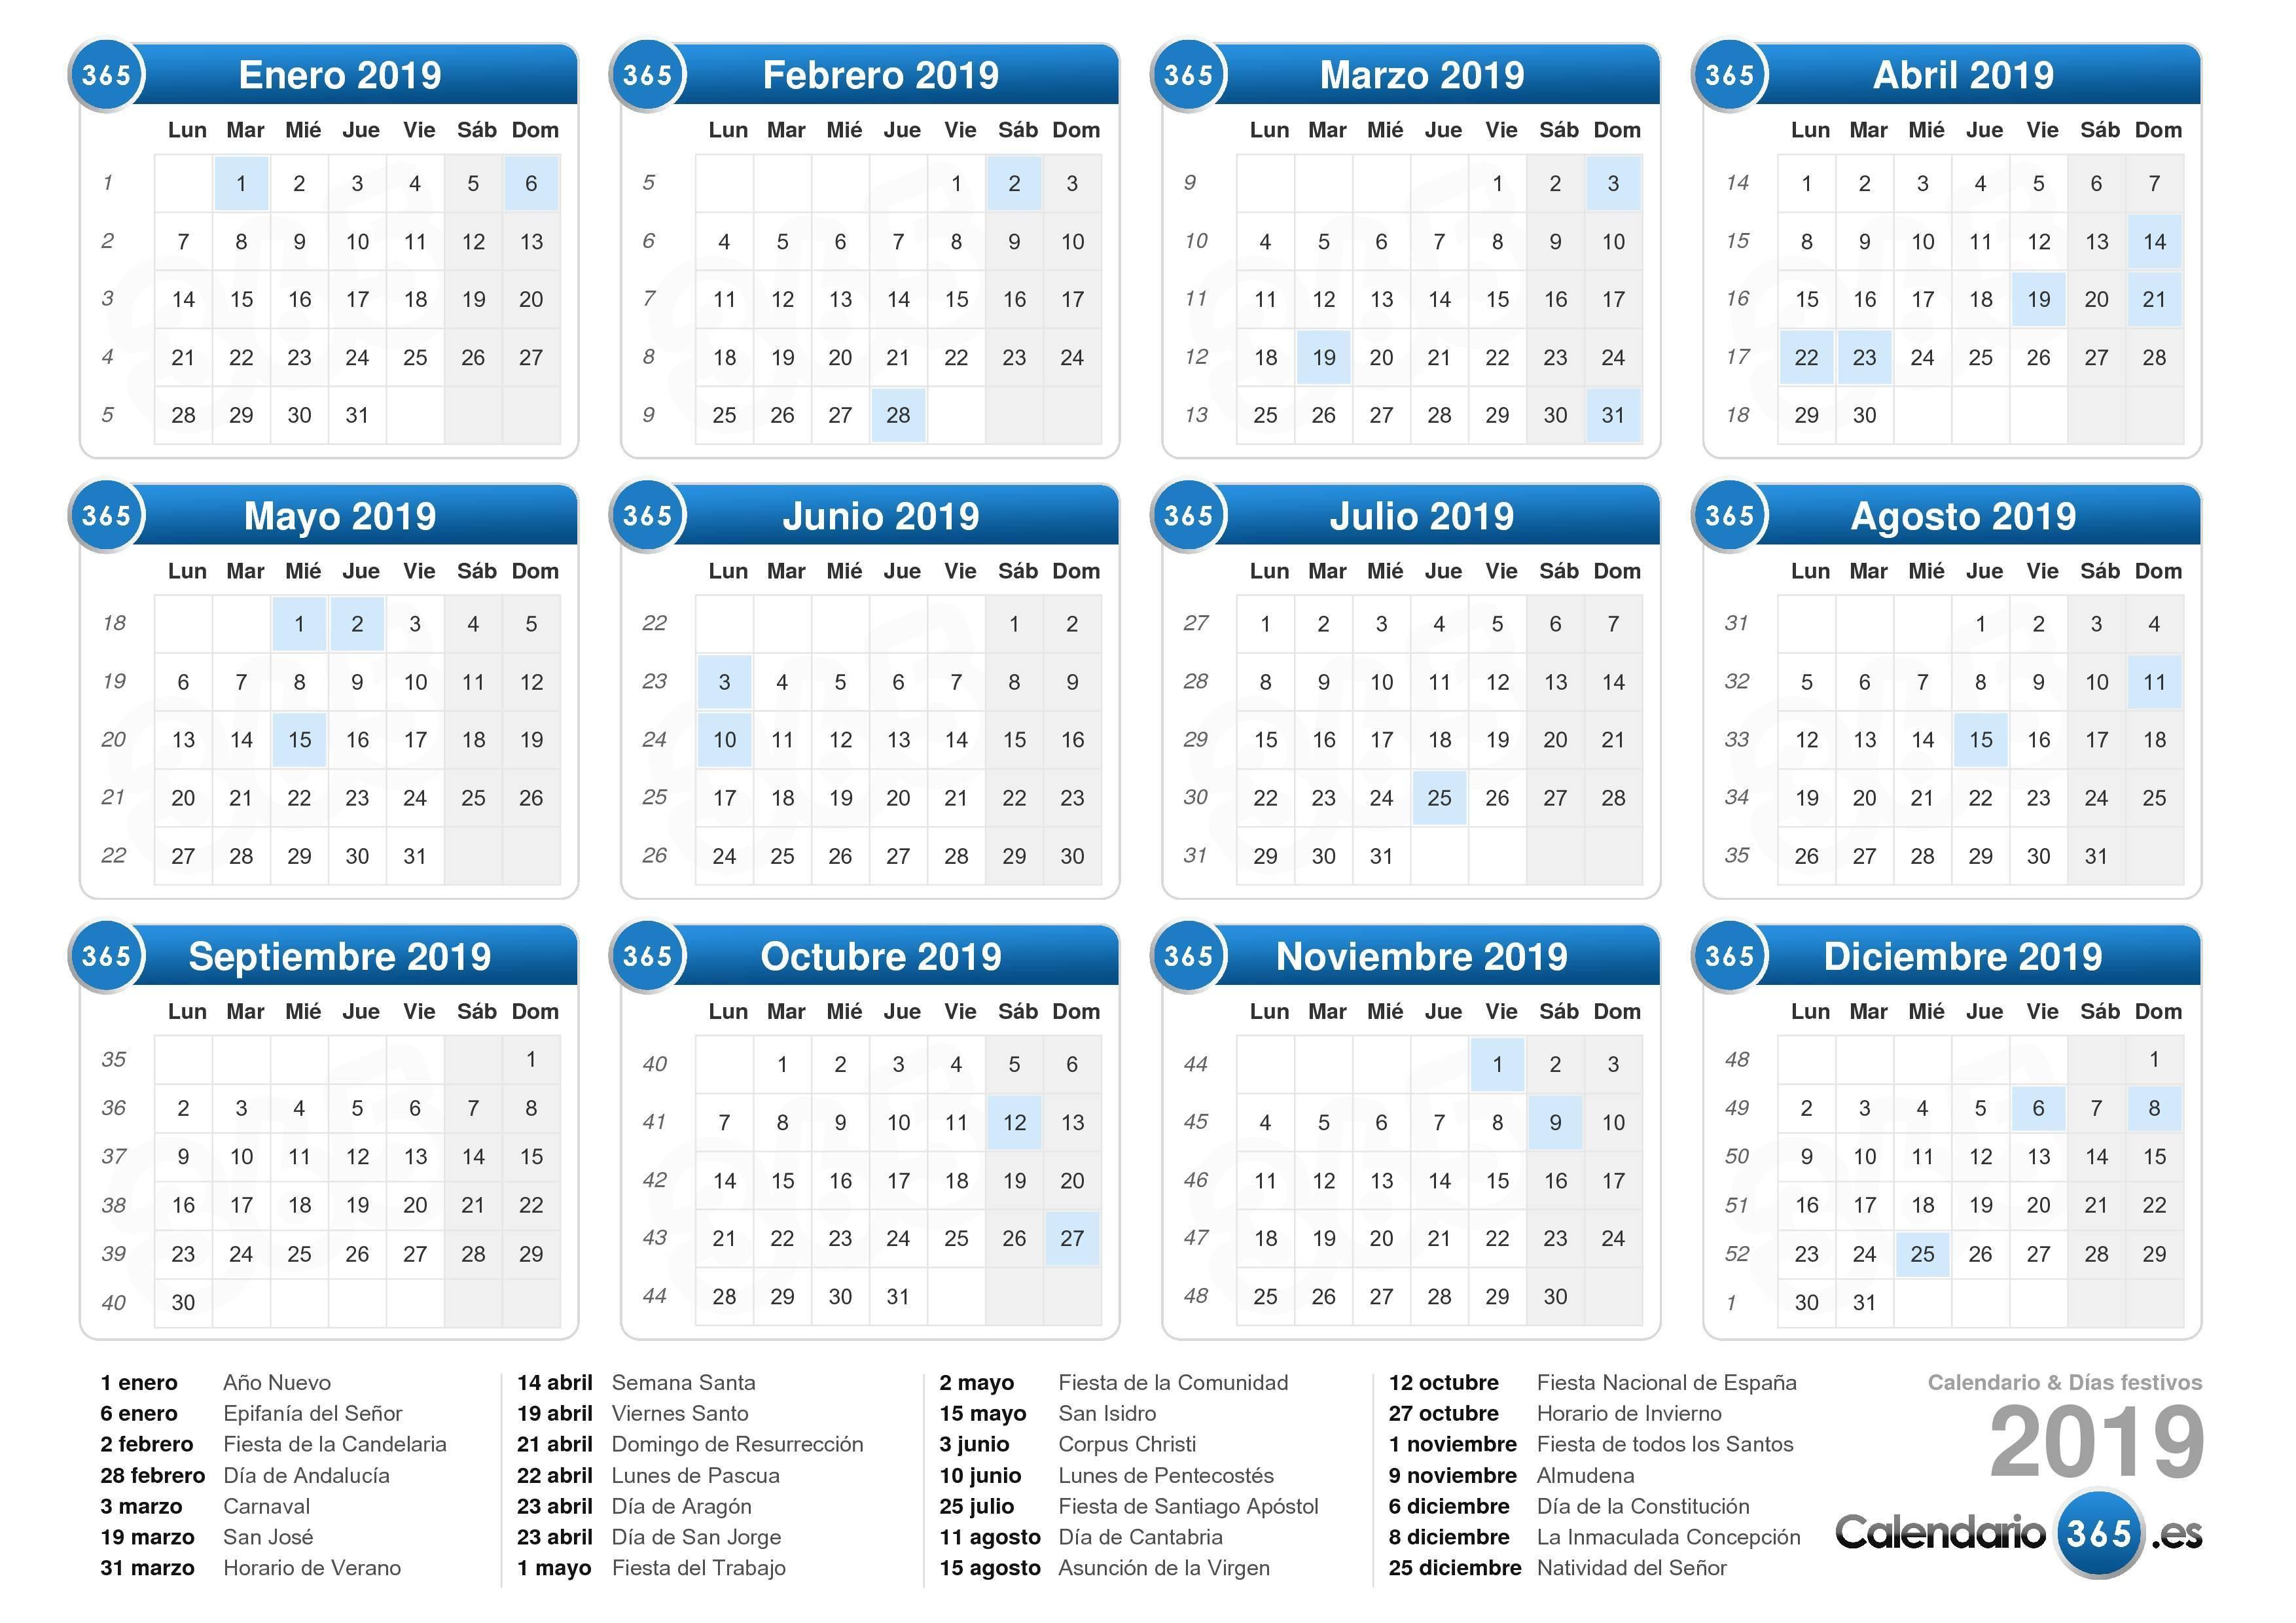 Calendario Diciembre 2018 Enero 2019 Colombia Actual Calendario 2019 Of Calendario Diciembre 2018 Enero 2019 Colombia Más Recientes Calaméo Gara